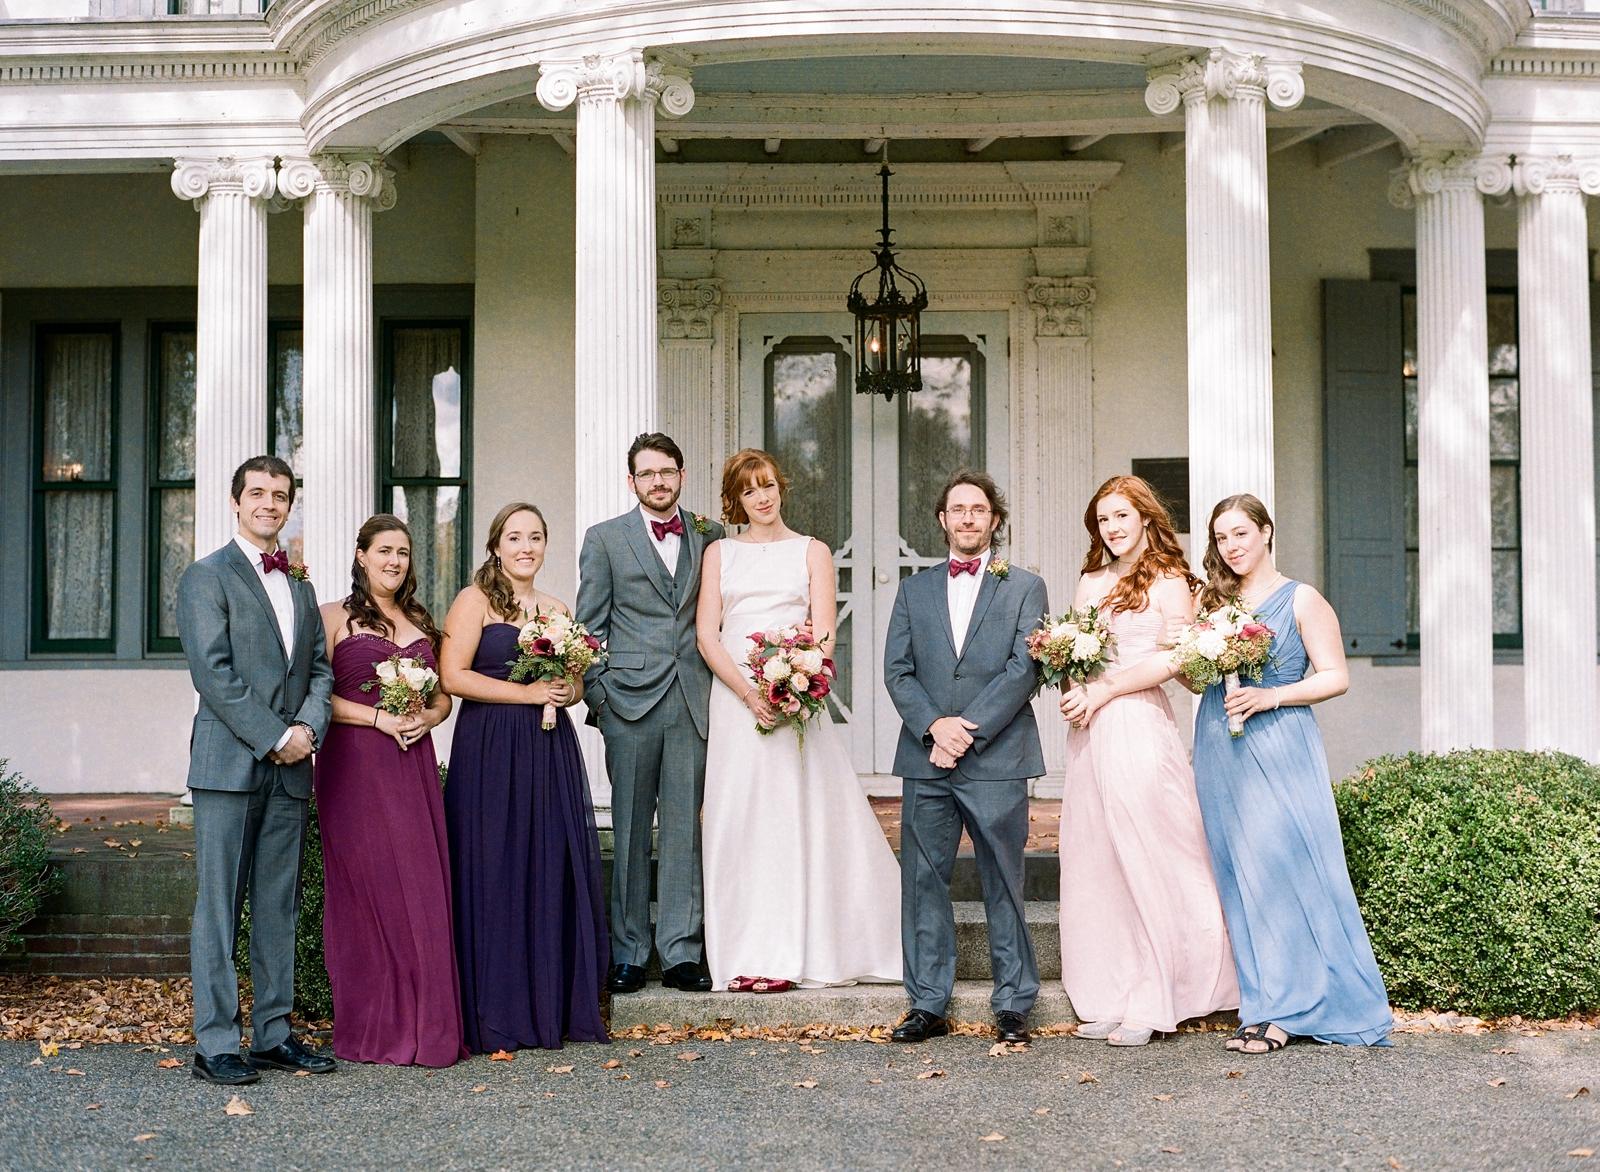 ringwood new jersey wedding photographer shannon griffin_0026.jpg